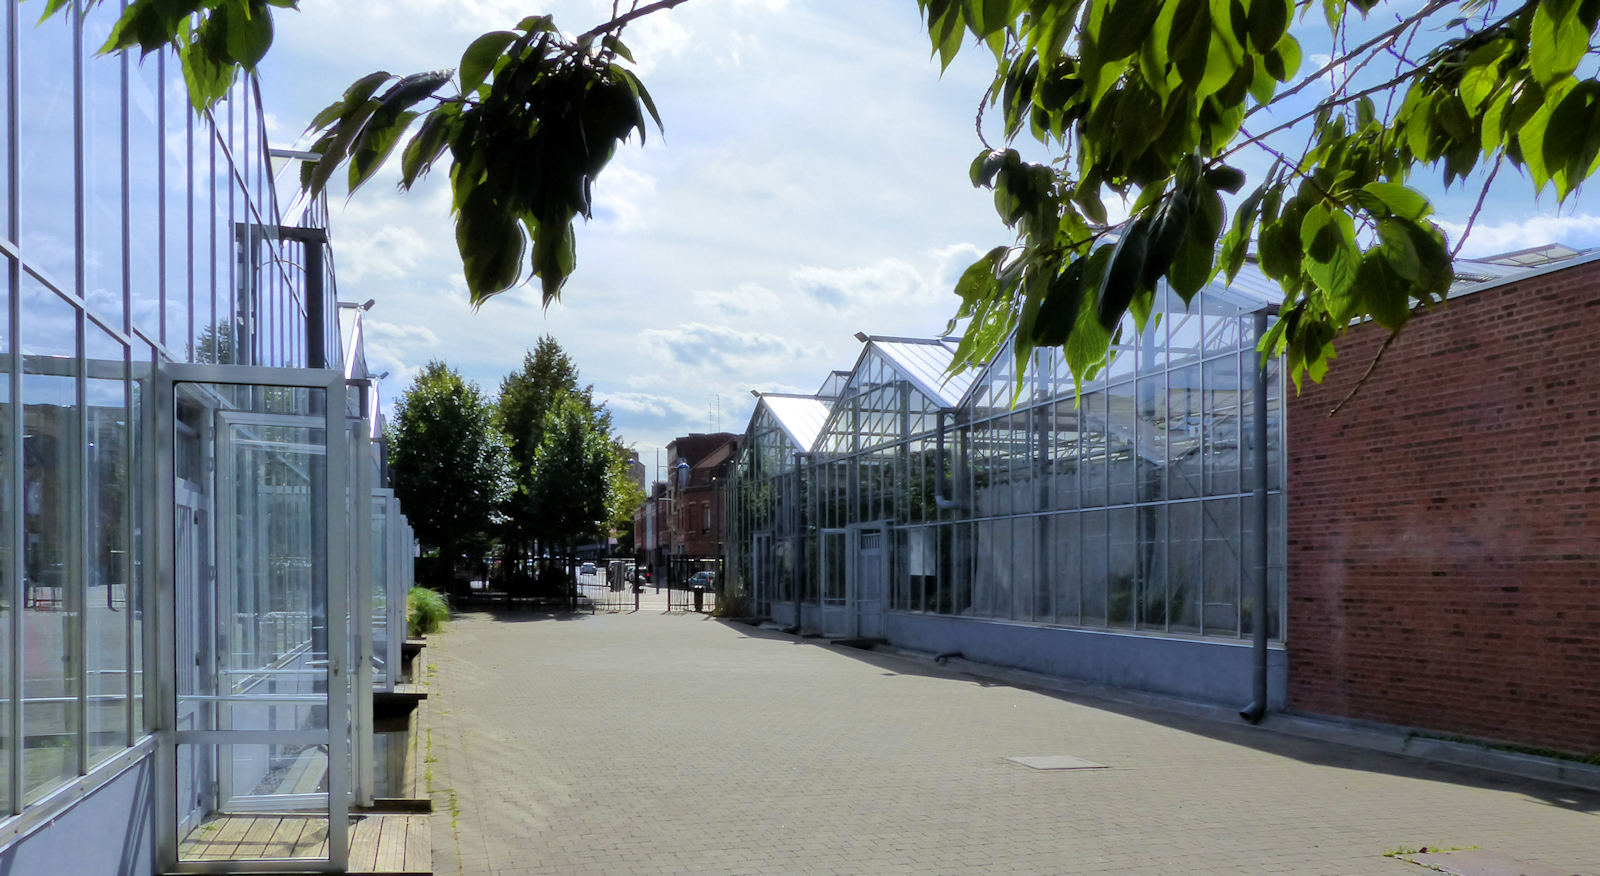 Jardin botanique, Tourcoing - Serres